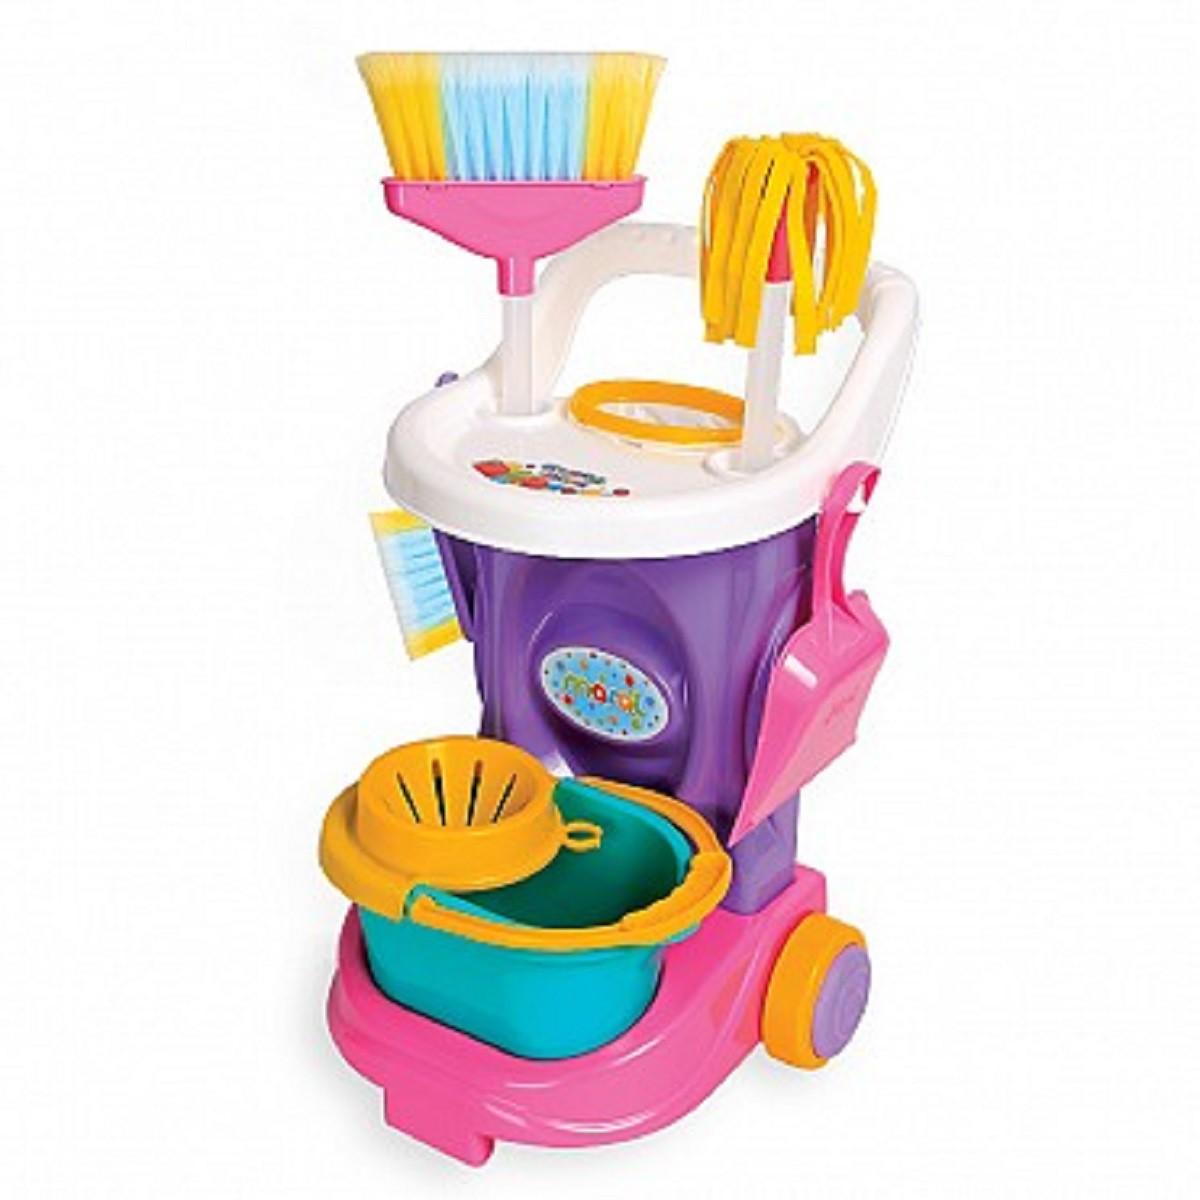 Kit De Limpeza Carrinho Infantil Brinquedo Cleaning Trolley